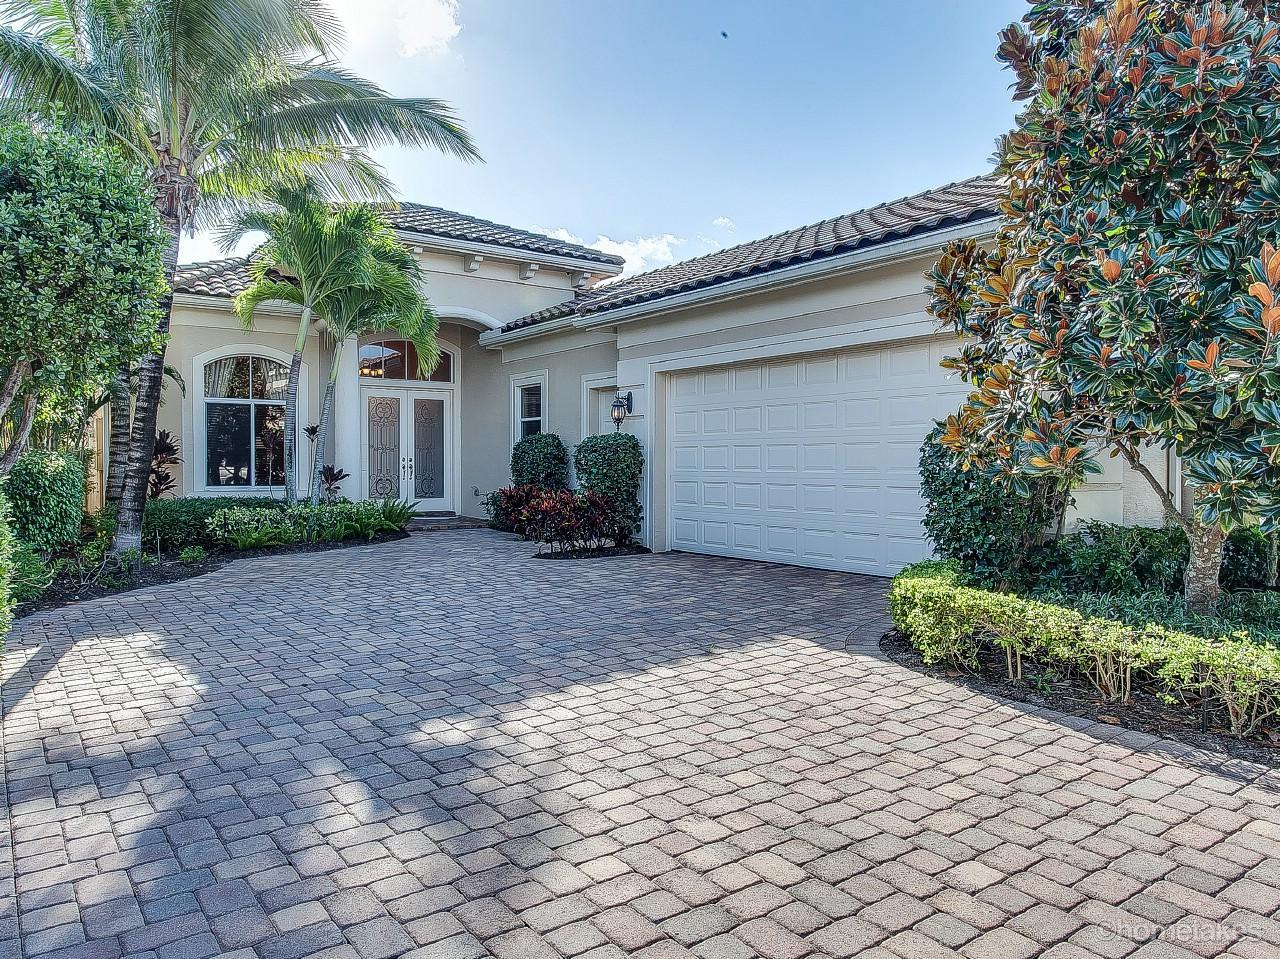 116 Bianca Drive, Palm Beach Gardens, Florida 33418, 3 Bedrooms Bedrooms, ,3.1 BathroomsBathrooms,F,Single family,Bianca,RX-10579696